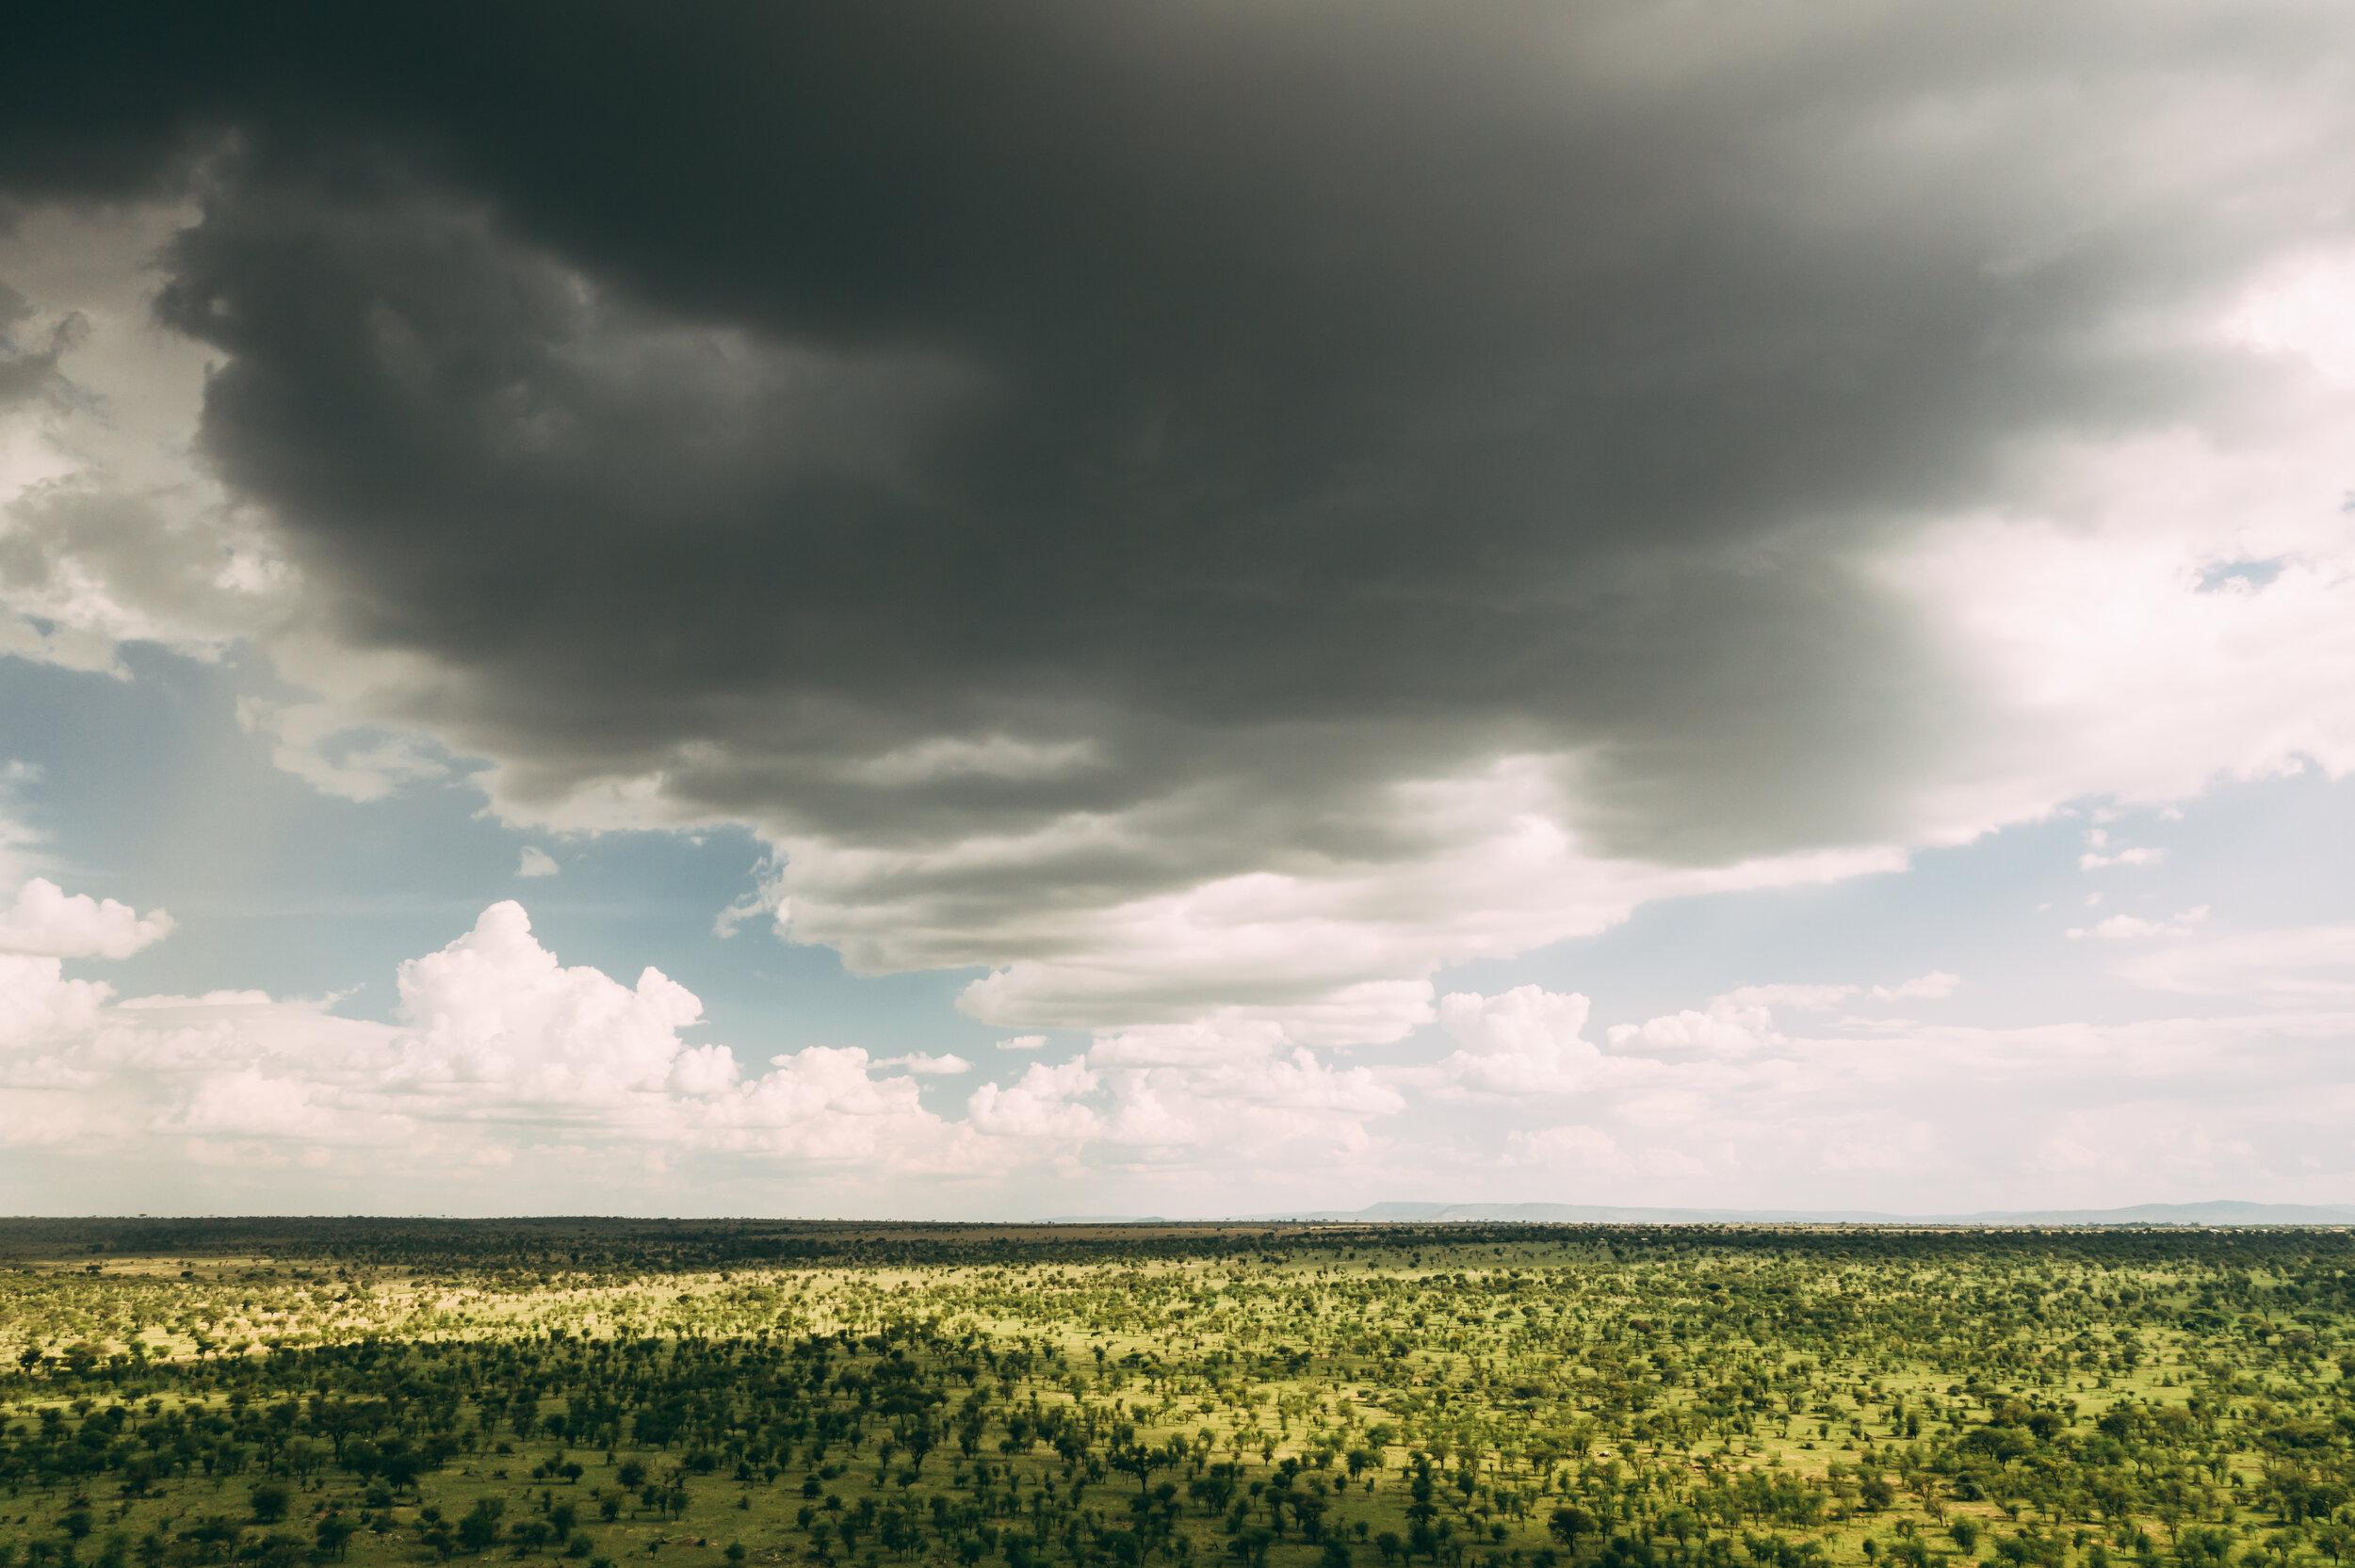 20190602_Tortilis_Serengeti_DJI_0789.jpg